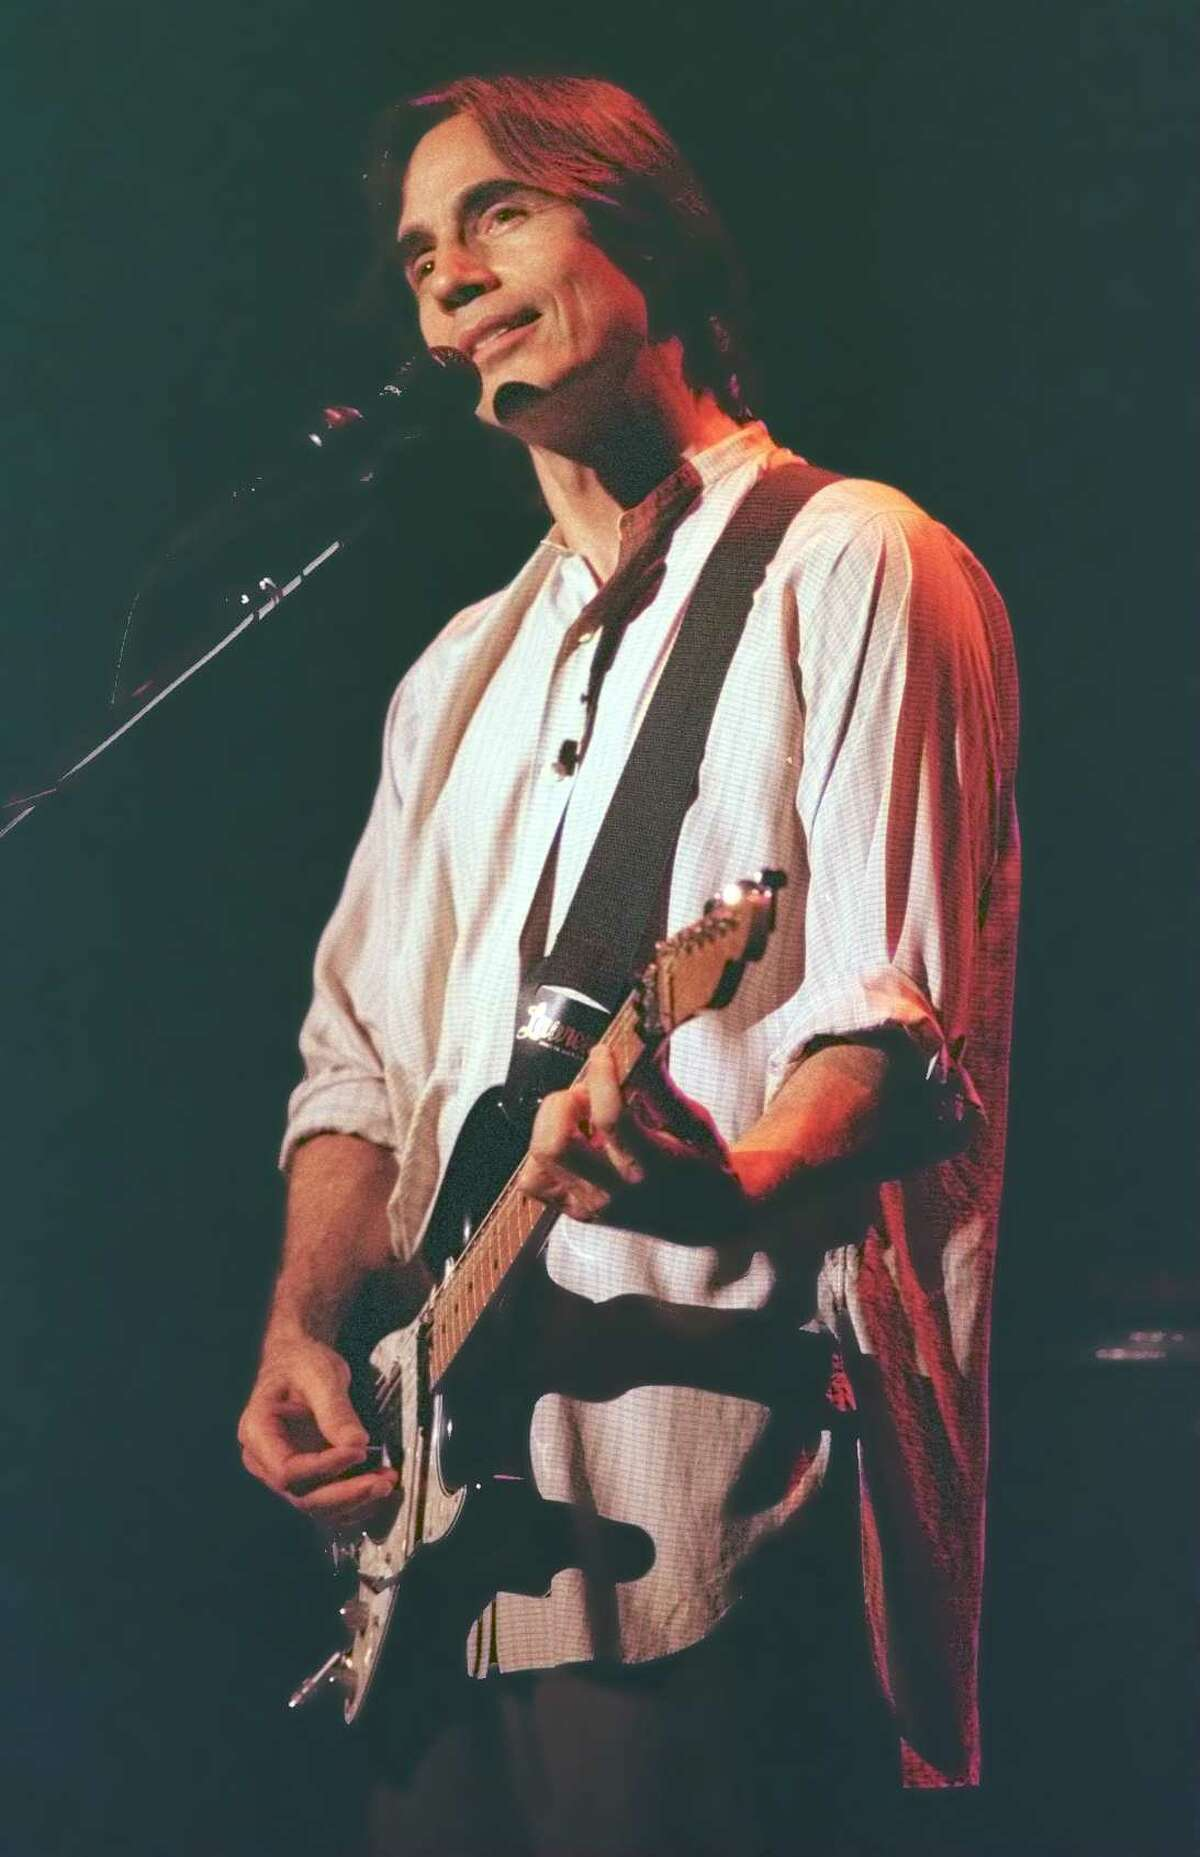 Jackson Browne performs at SPAC, August 4, 1996.